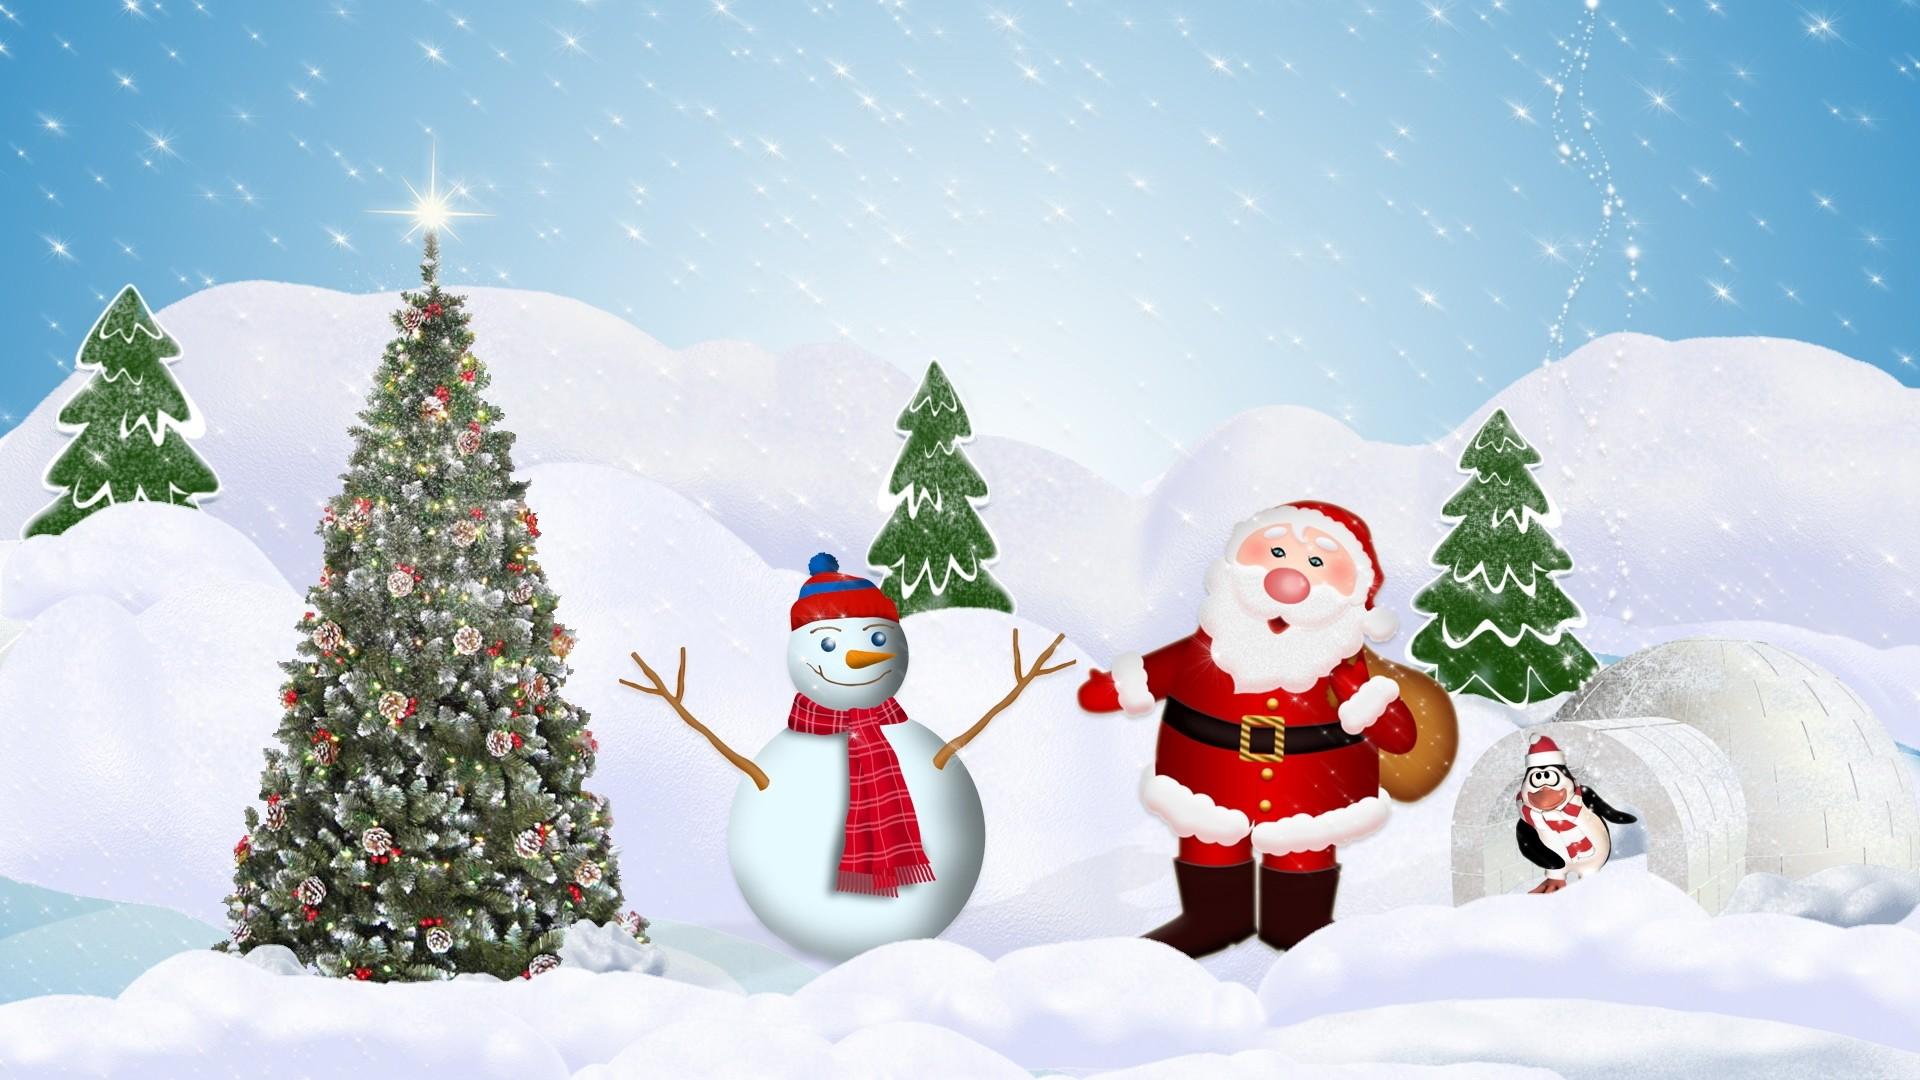 santa claus and snowman wallpaper 7353